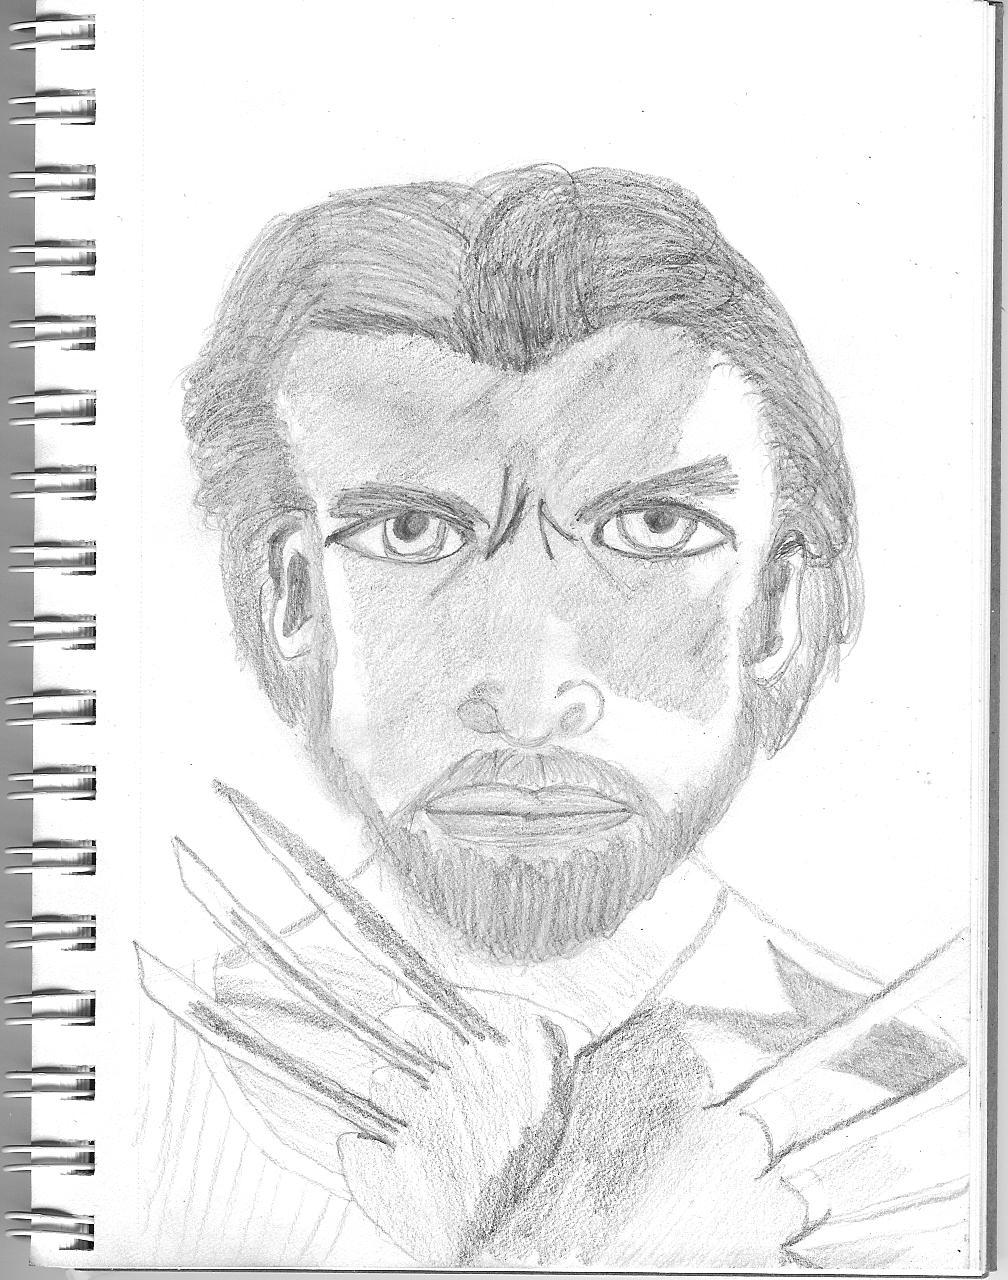 Wolverine by wandakff